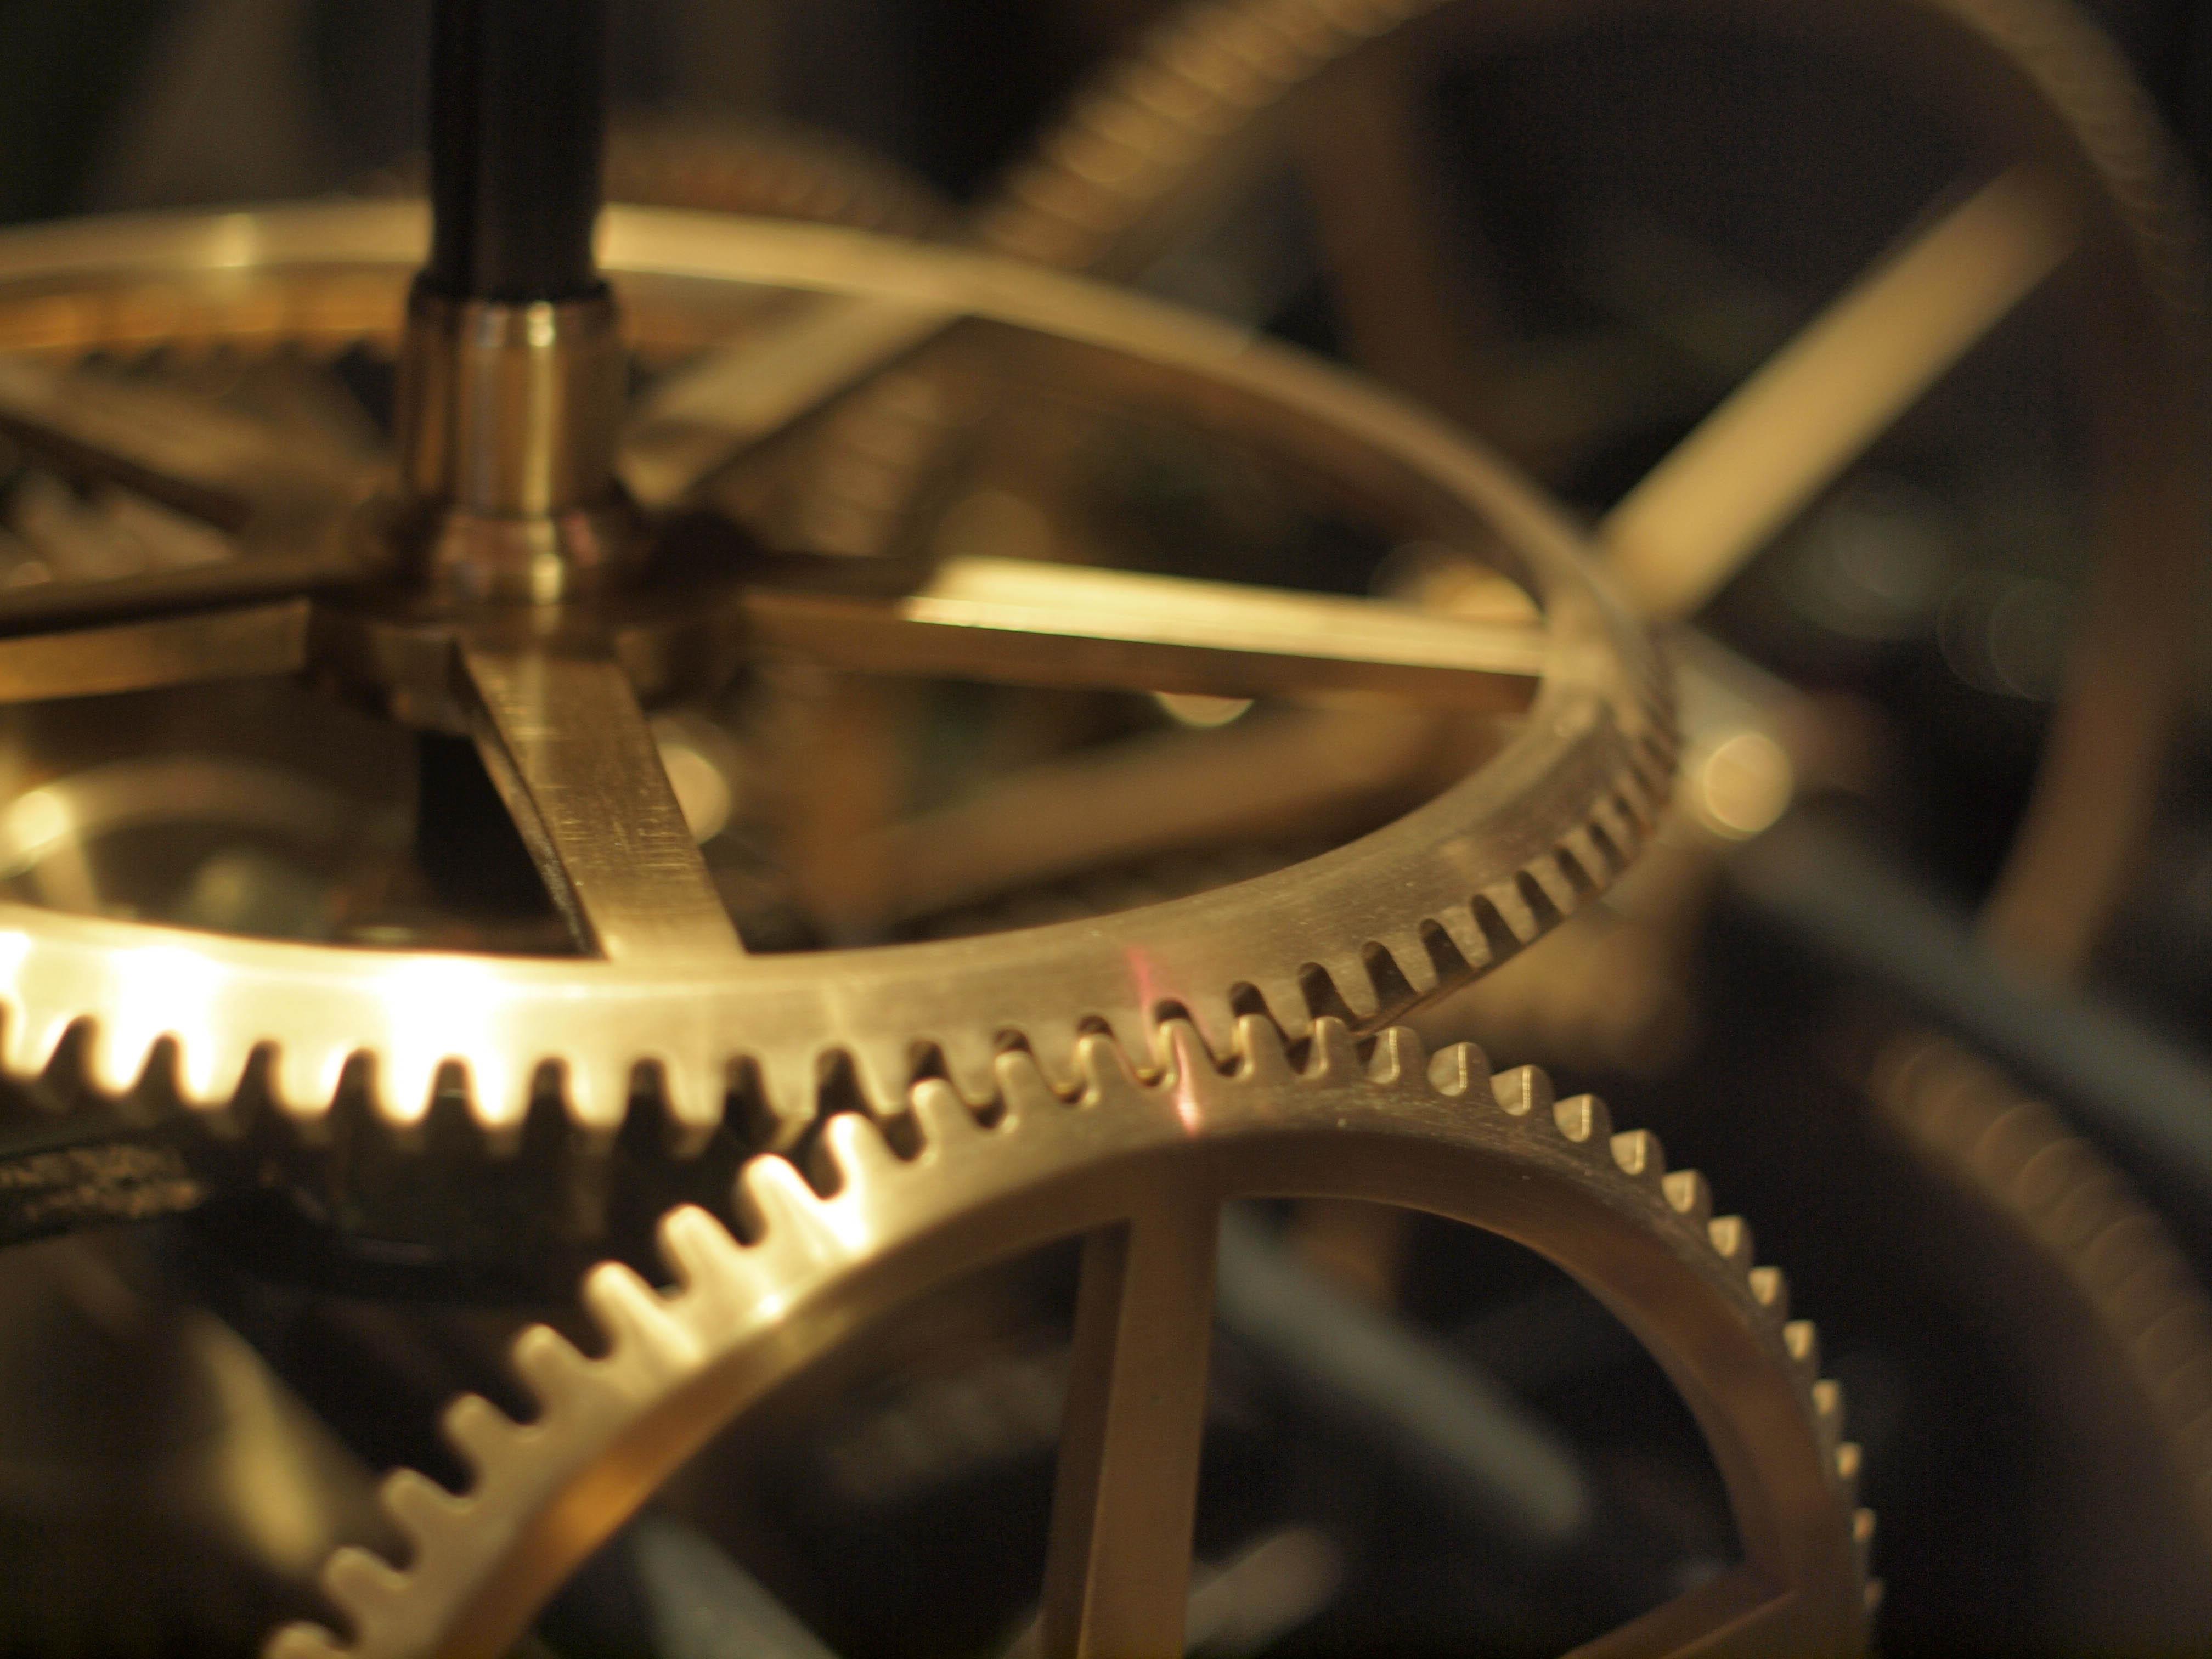 File:Clock Cogs.jpg - Wikimedia Commons